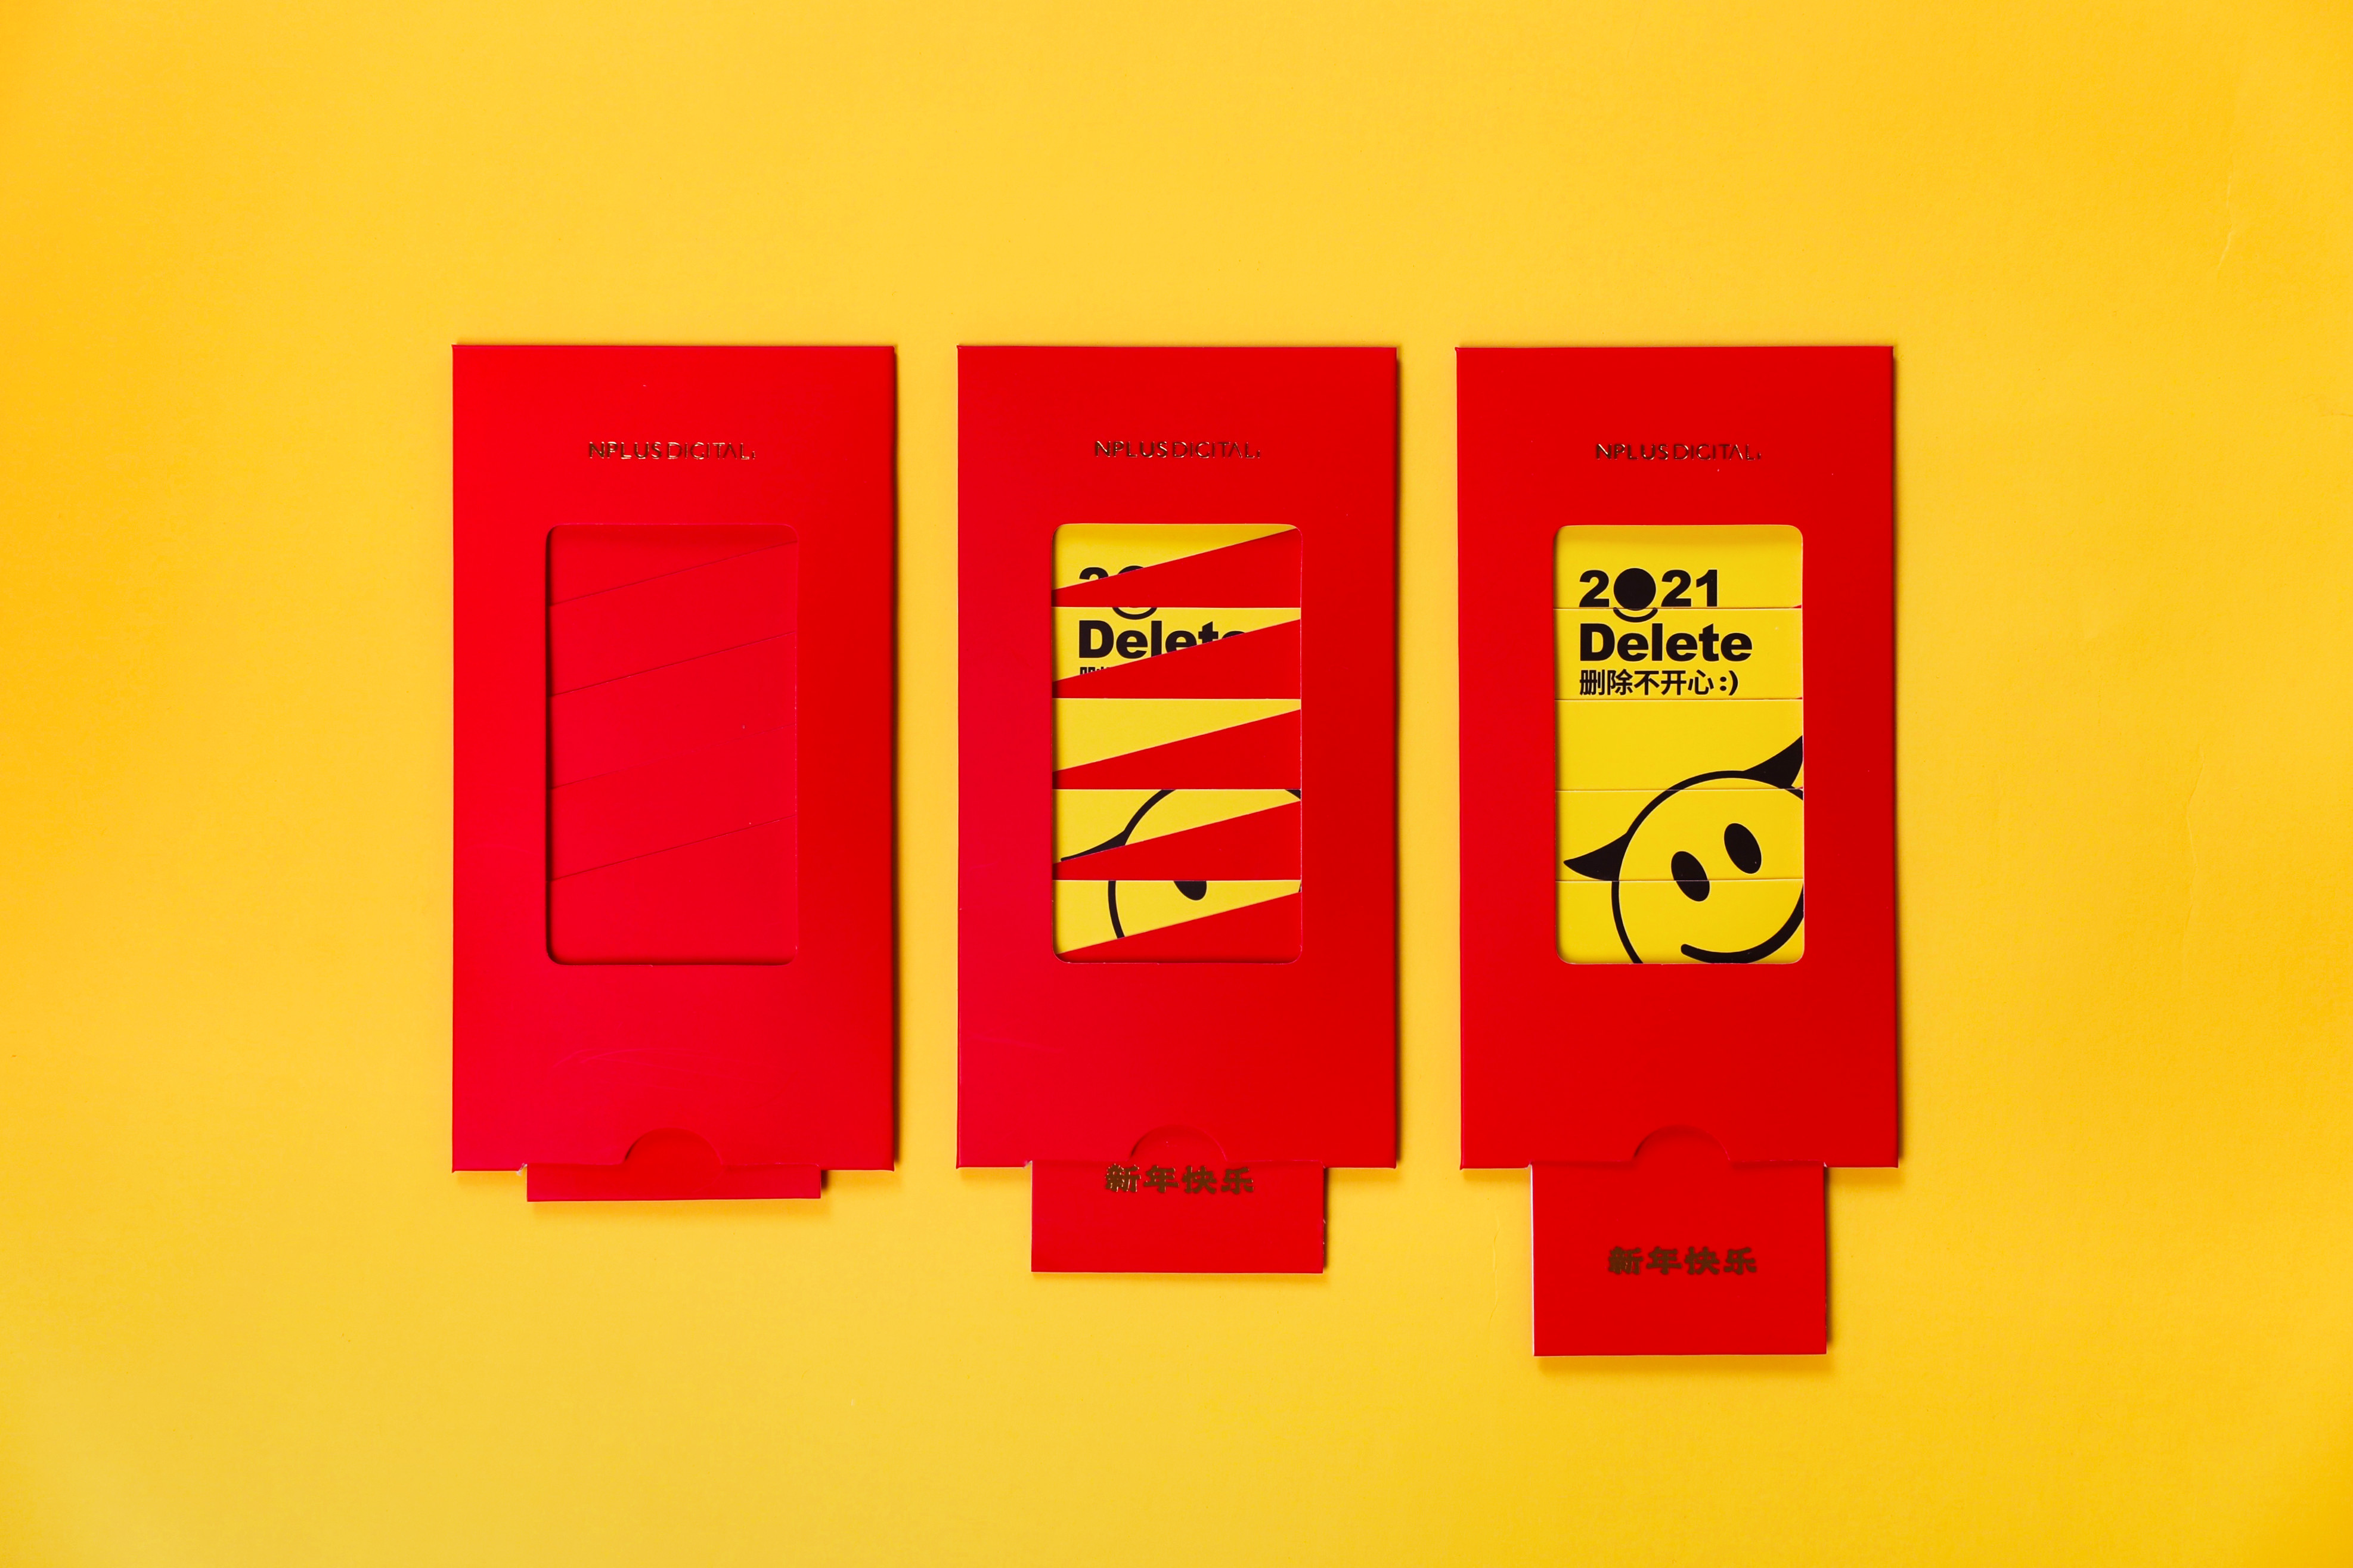 NPLUS 新年礼盒:把过去的不开心,打包删除